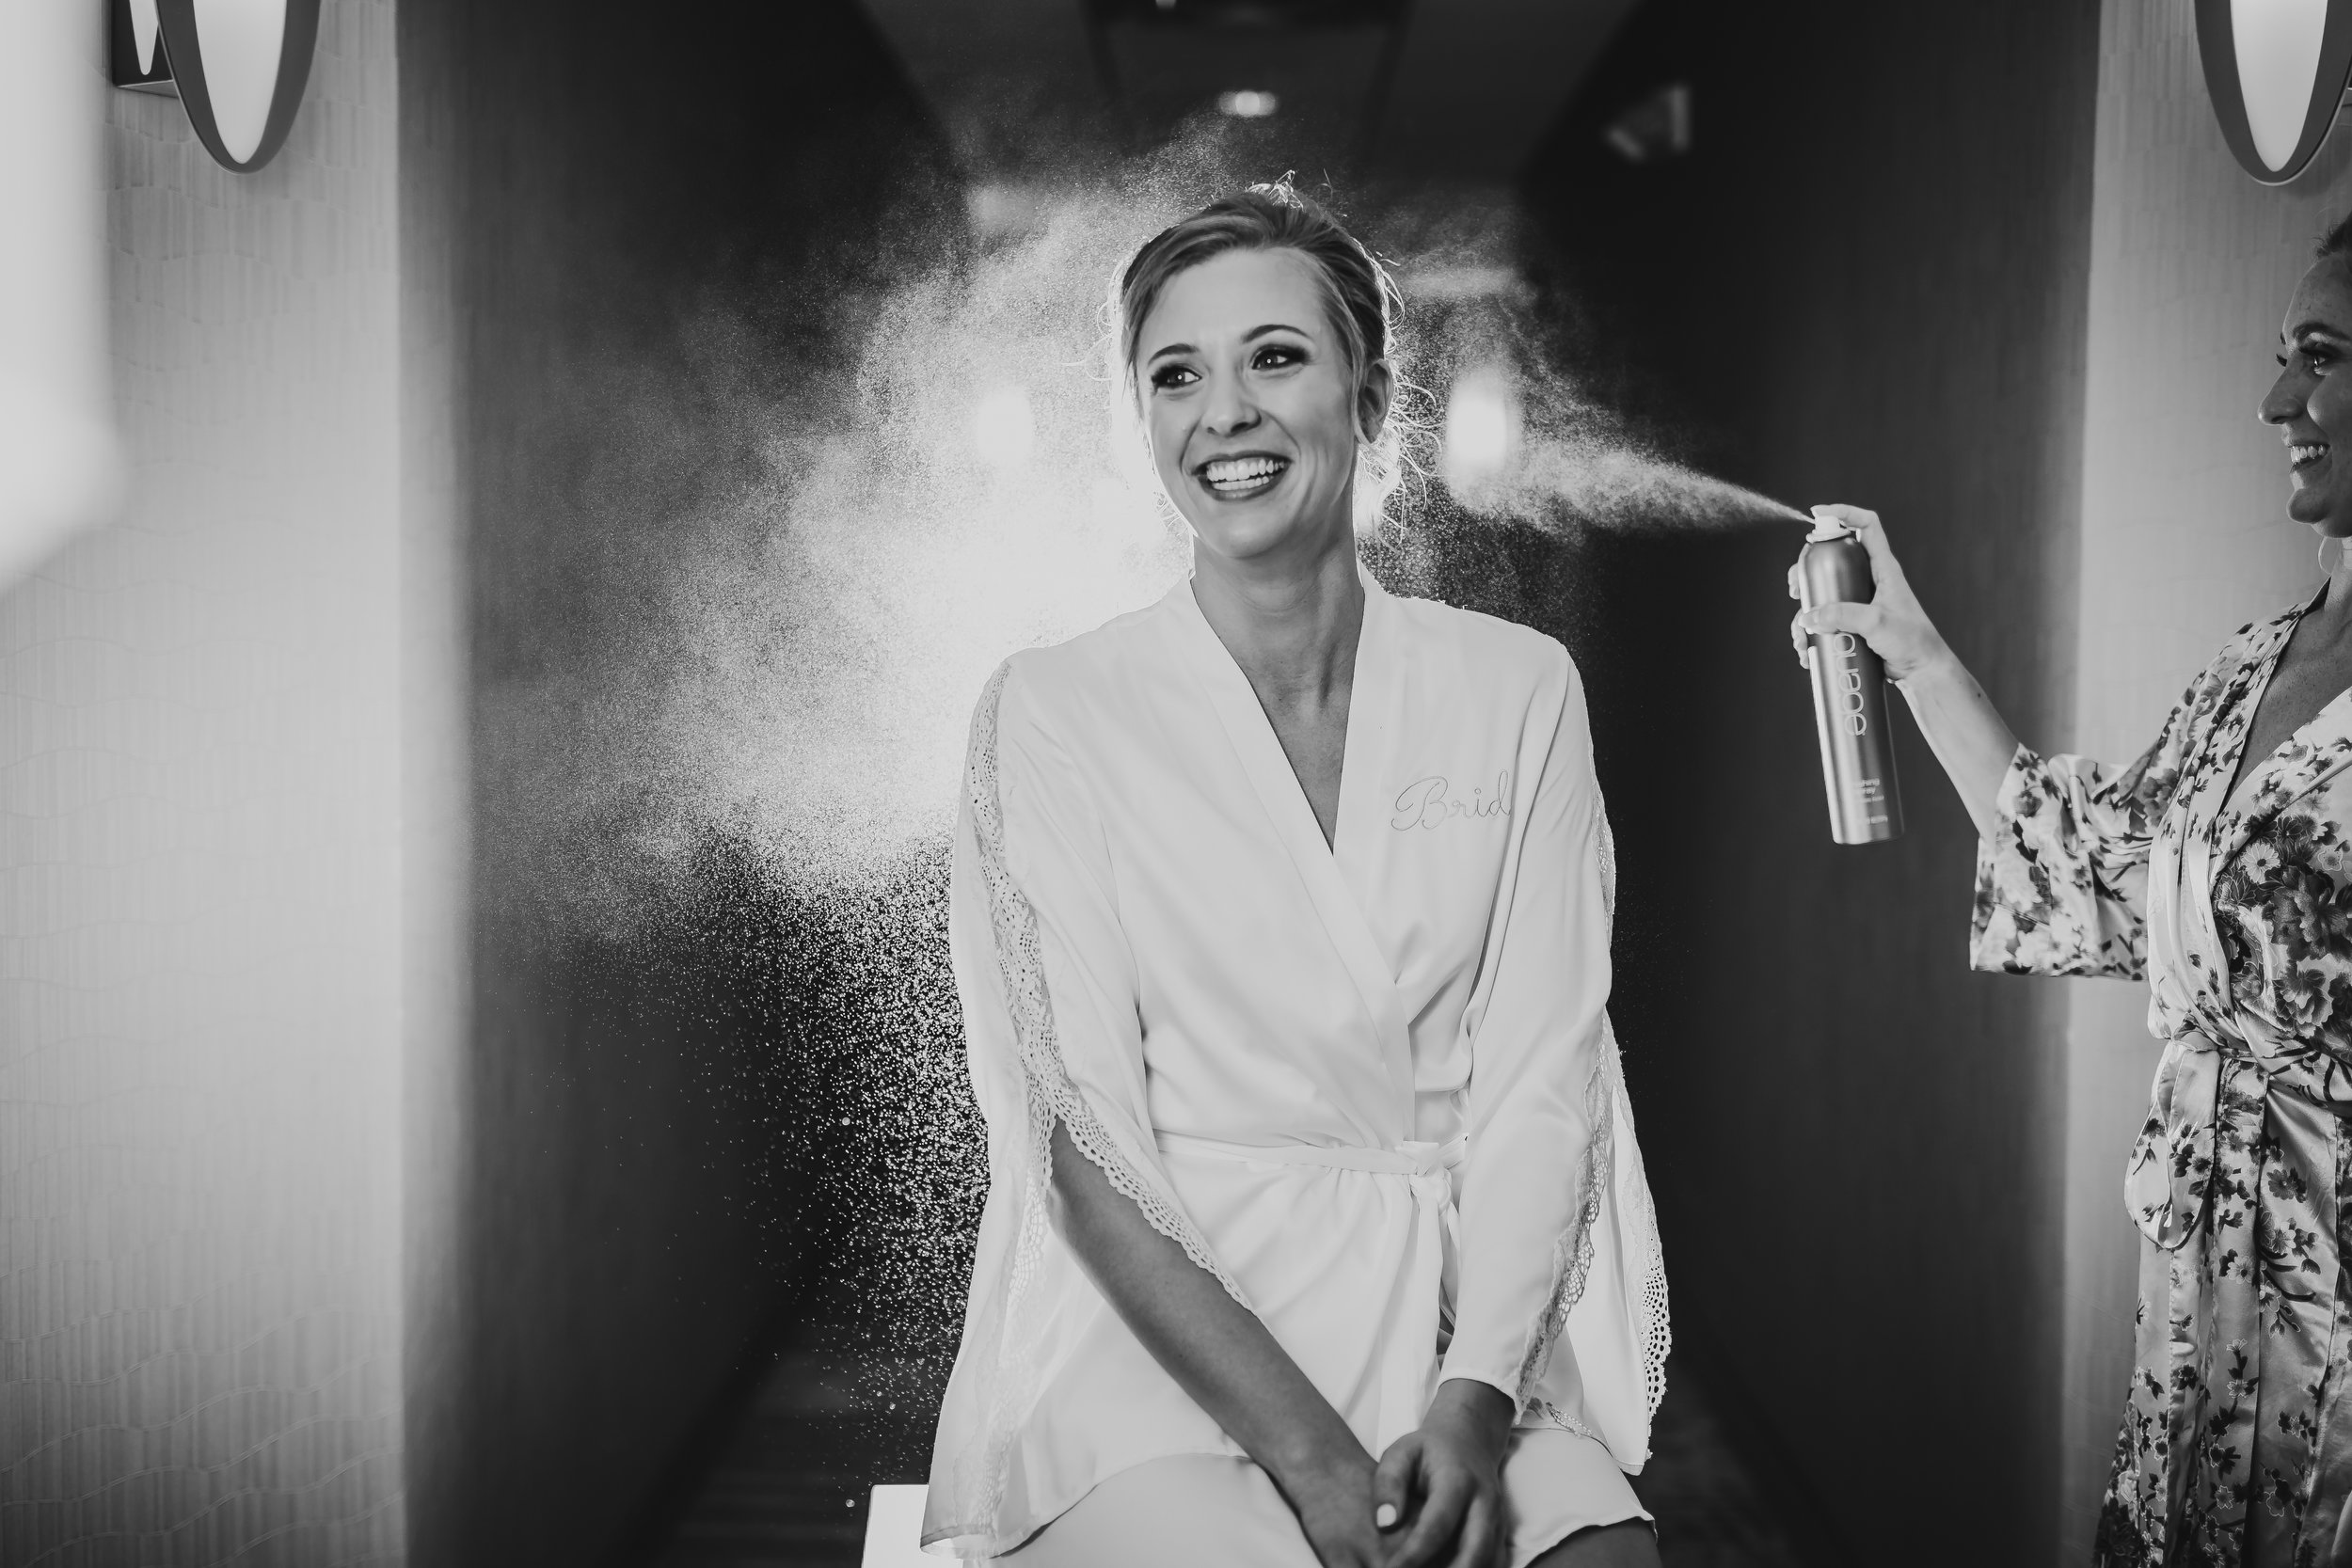 bride-getting-ready-in-hotel-lauren-ashley-studios-hair-spray-photo.jpg